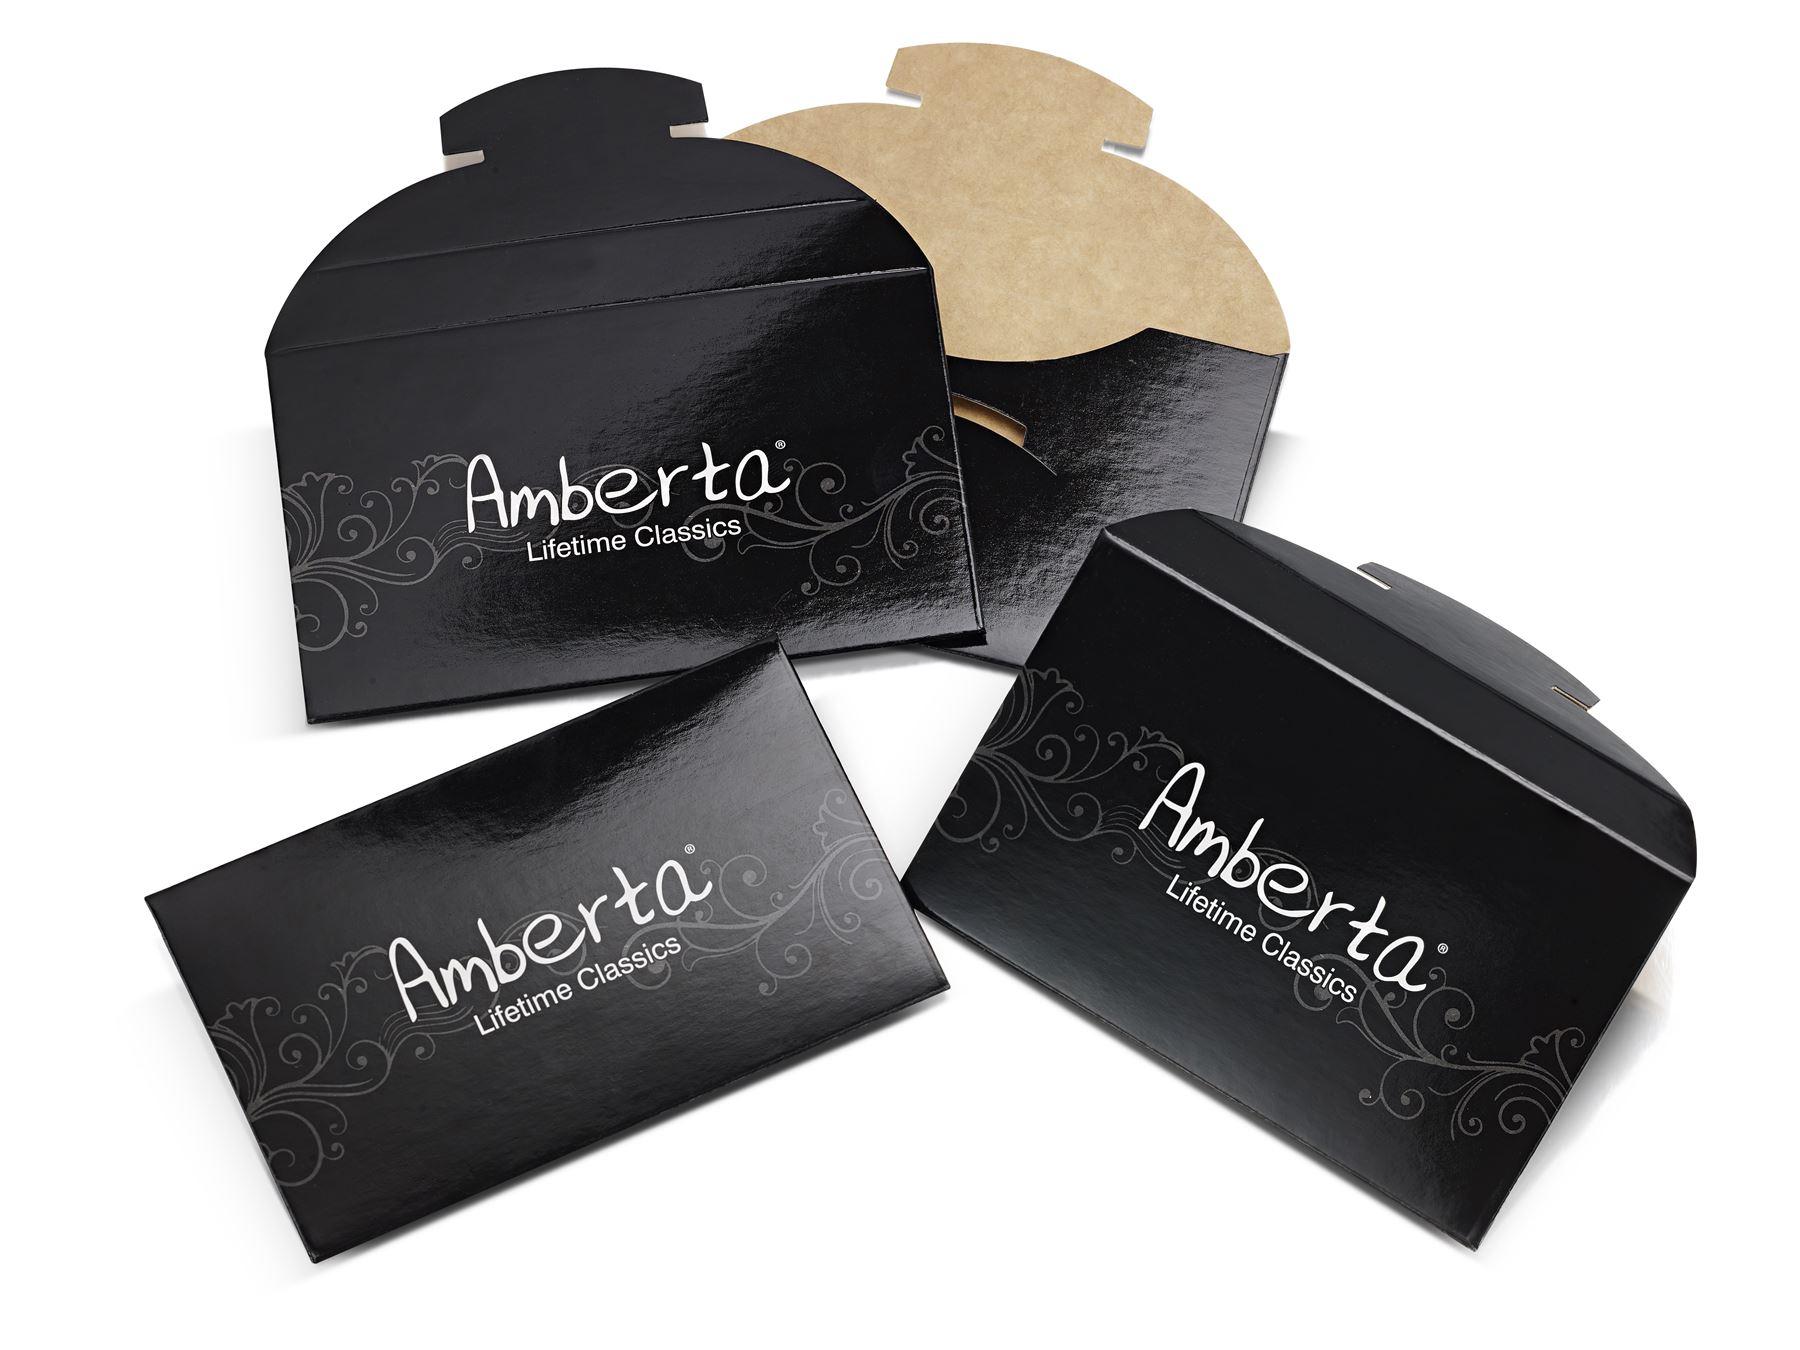 Amberta-Jewelry-925-Sterling-Silver-Adjustable-Anklet-Foot-Bracelet-for-Women miniature 50